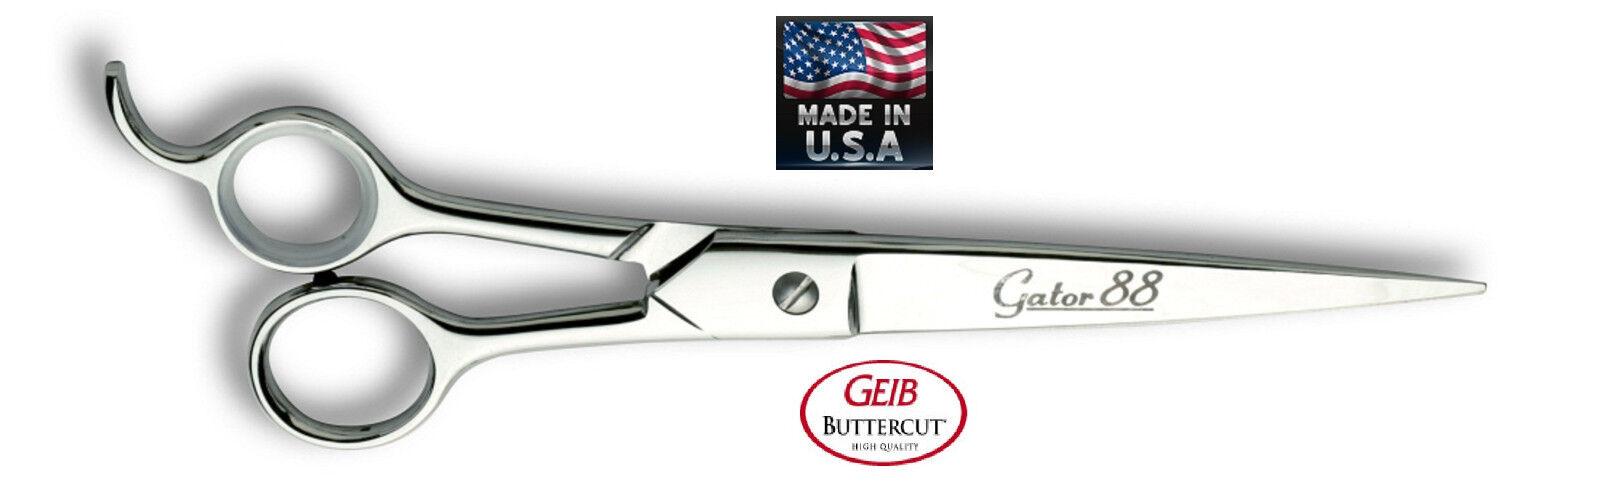 GEIB Buttercut GATOR 88 STRAIGHT PRO Shears 8 12 PET DOG CAT Grooming Scissors